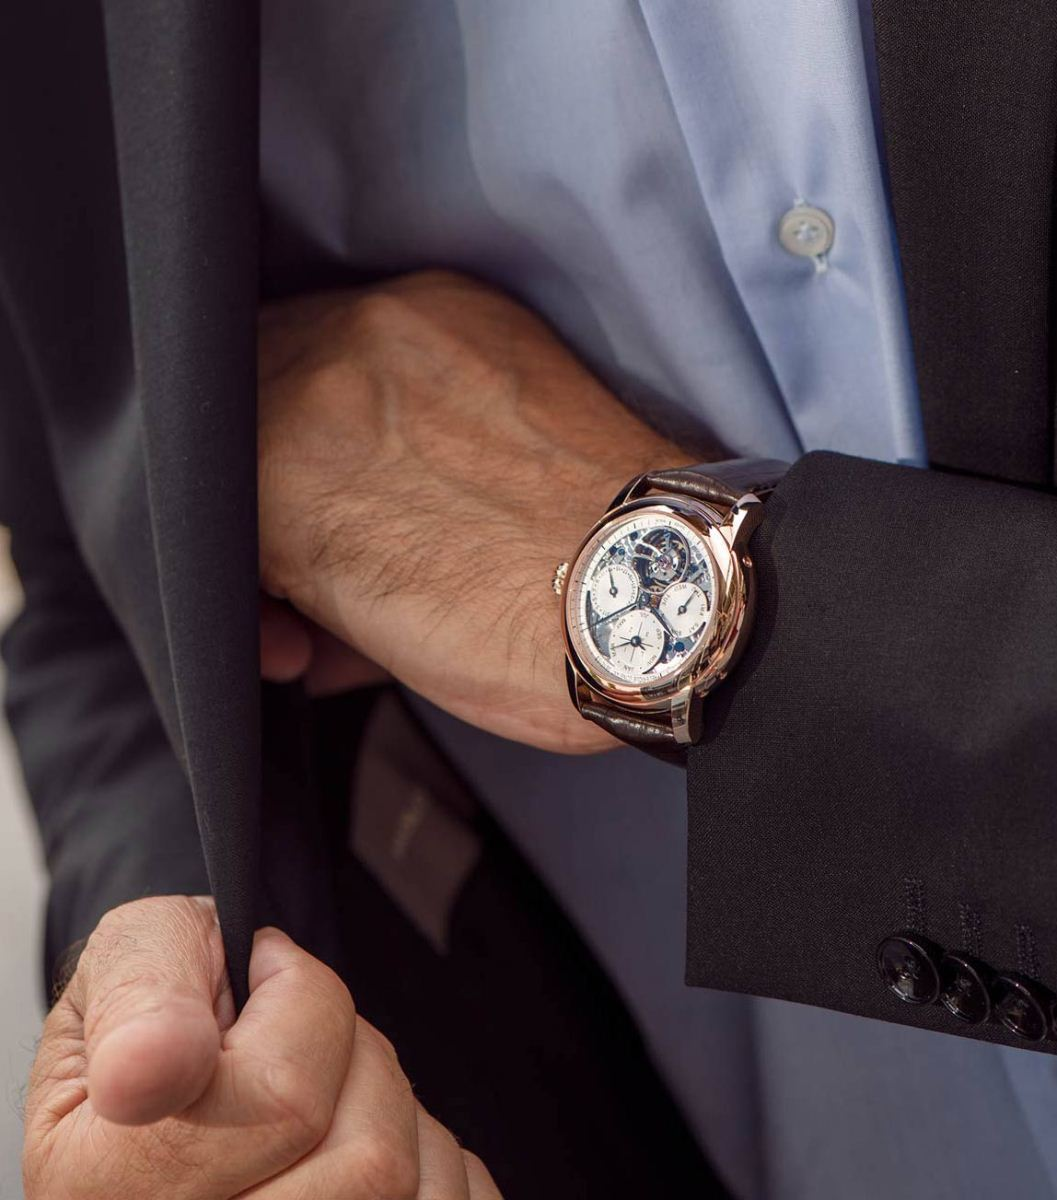 đồng hồ Perpetual Calendar Tourbillon Manufacture